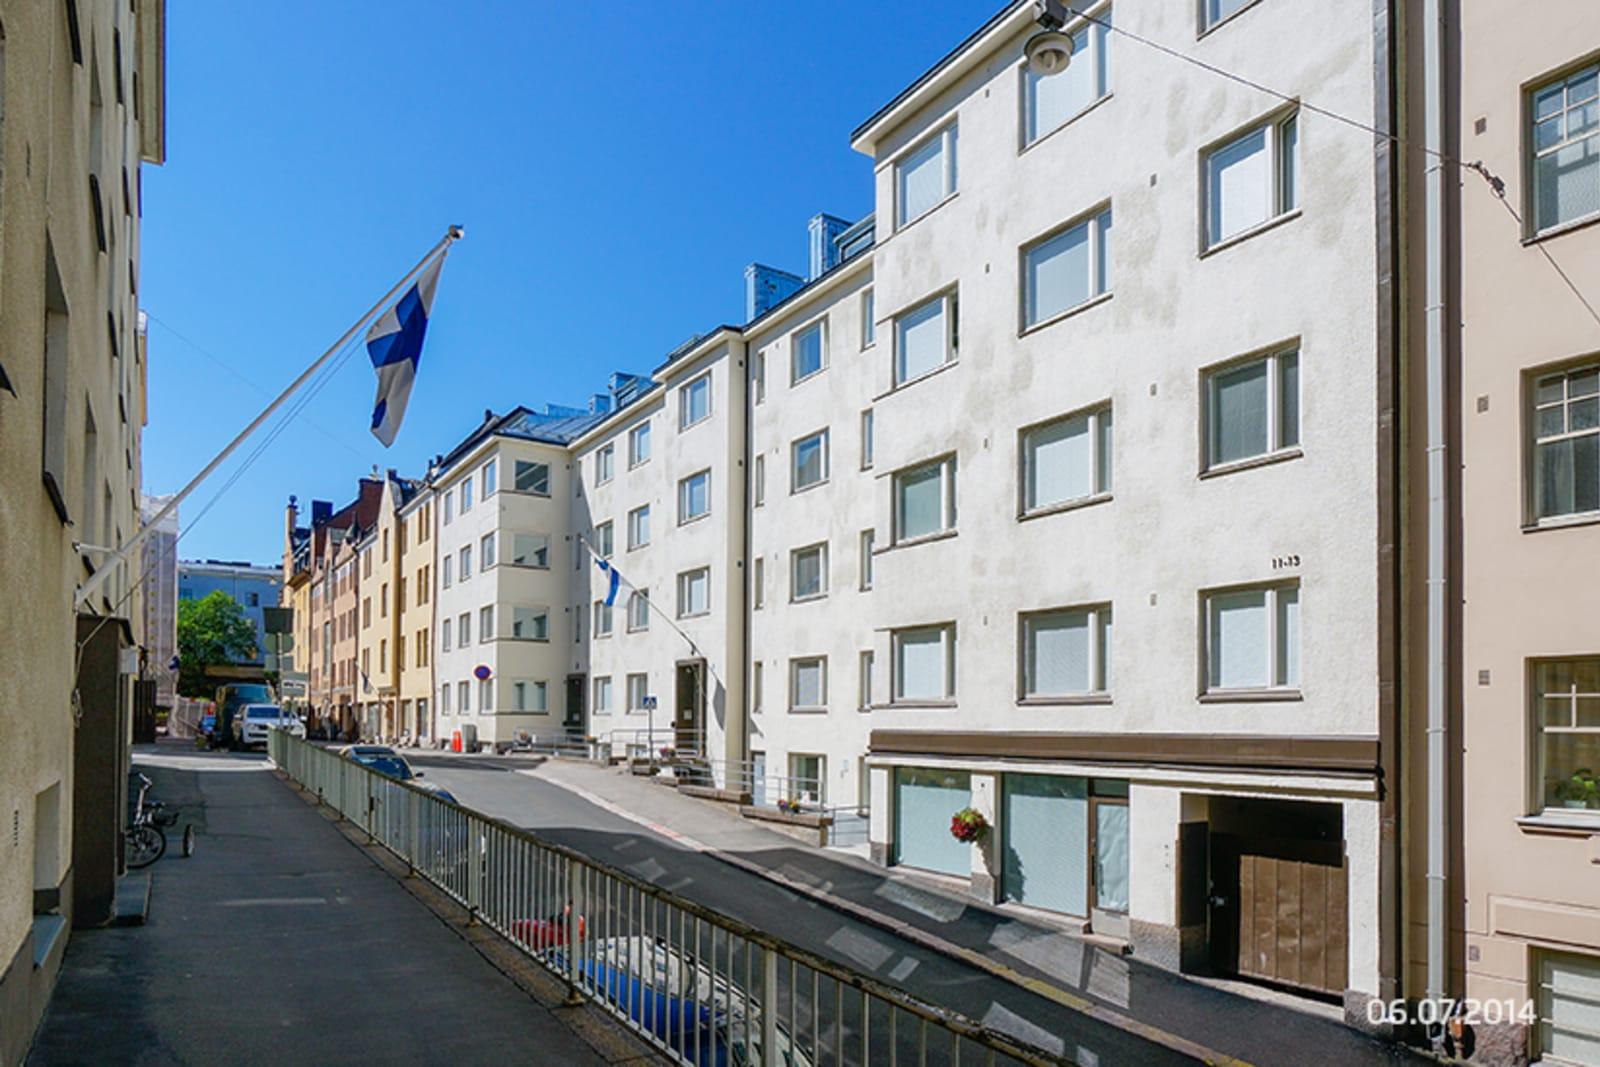 Helsinki, Kruununhaka, Kristianinkatu 11-13